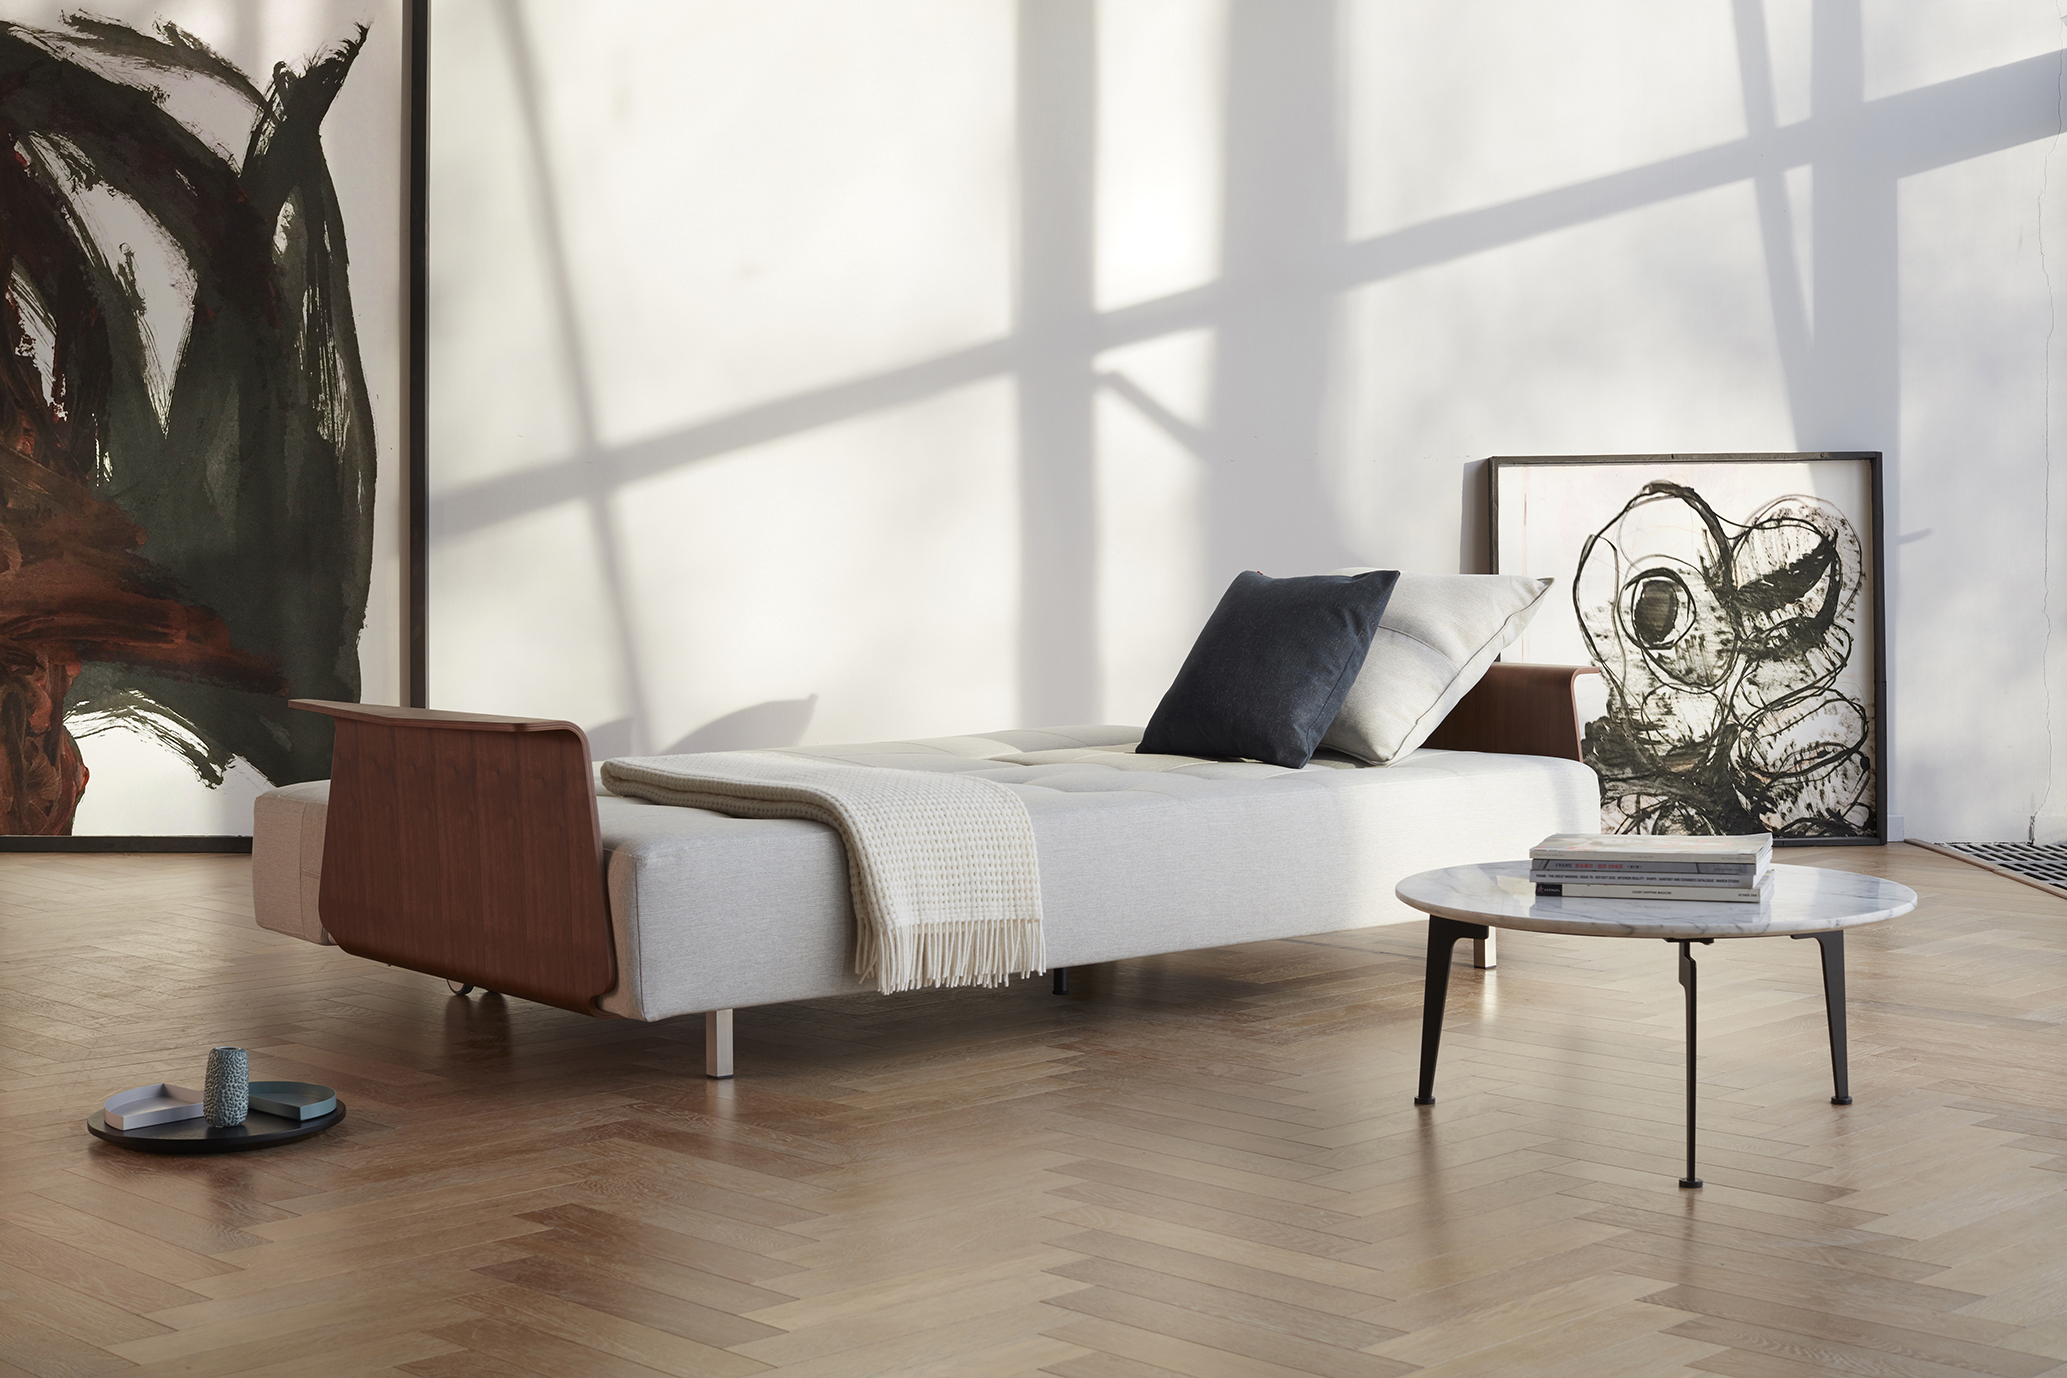 Long-horn-sofa-bed-oliver-luaks-weisskrogh-2.jpg